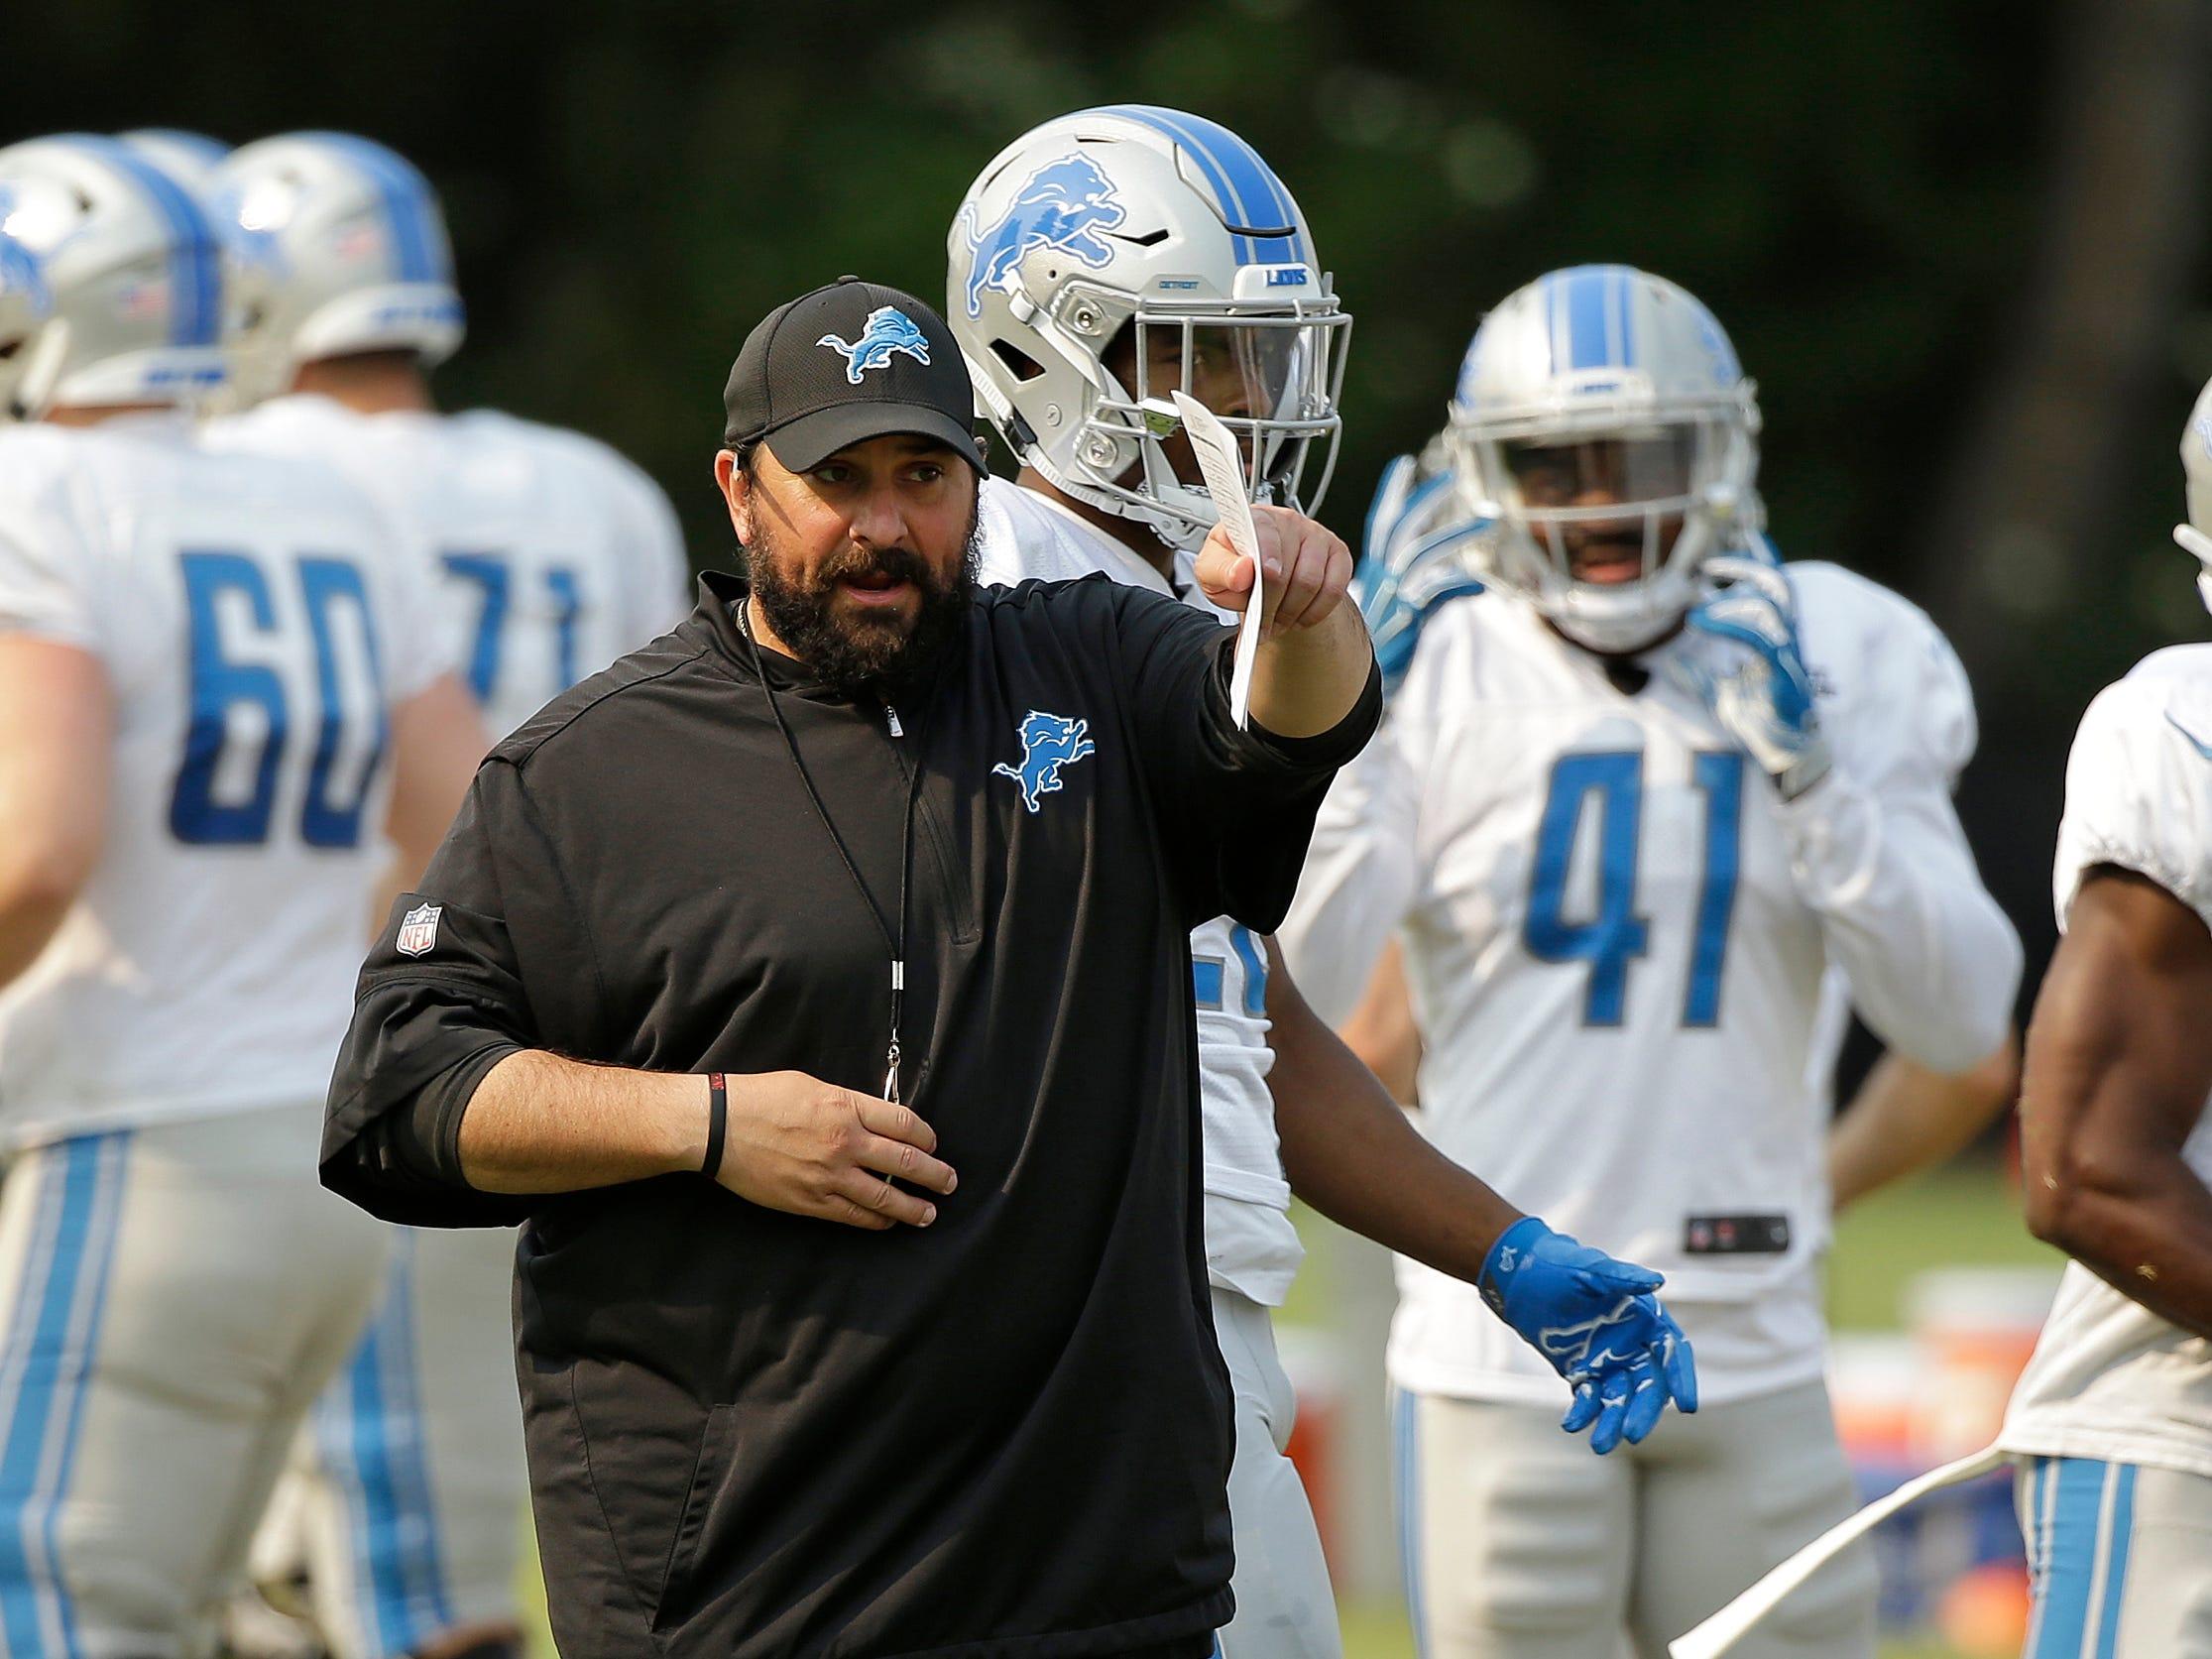 Lions head coach Matt Patricia gives instructions.